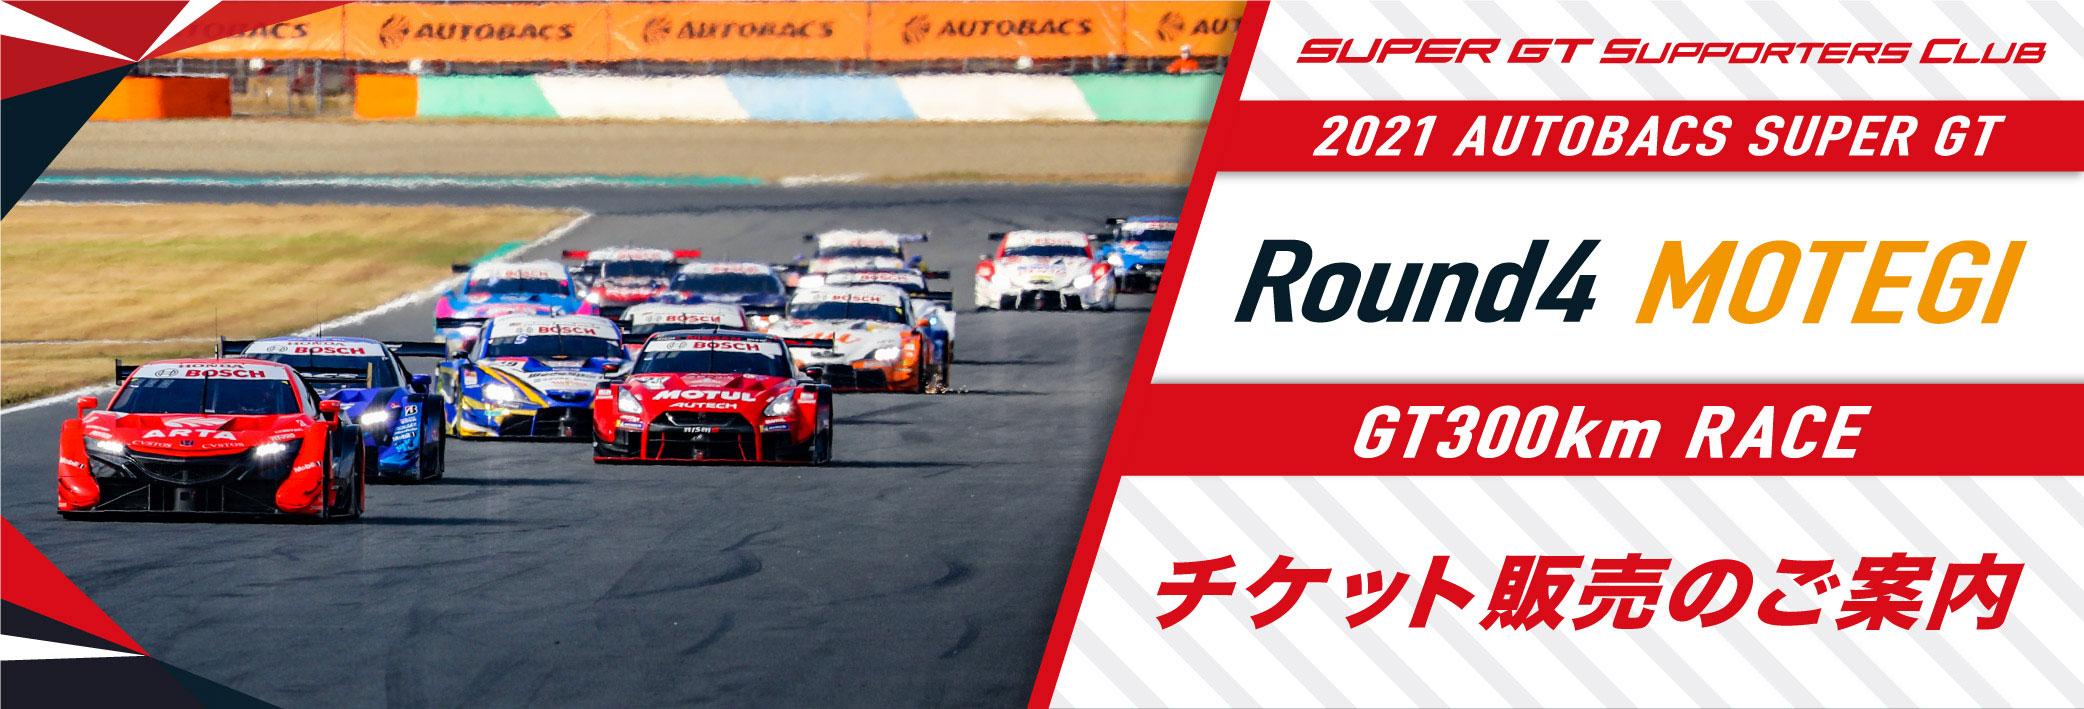 2021 AUTOBACS SUPER GT Round4 MOTEGI GT 300km RACE チケット販売のご案内